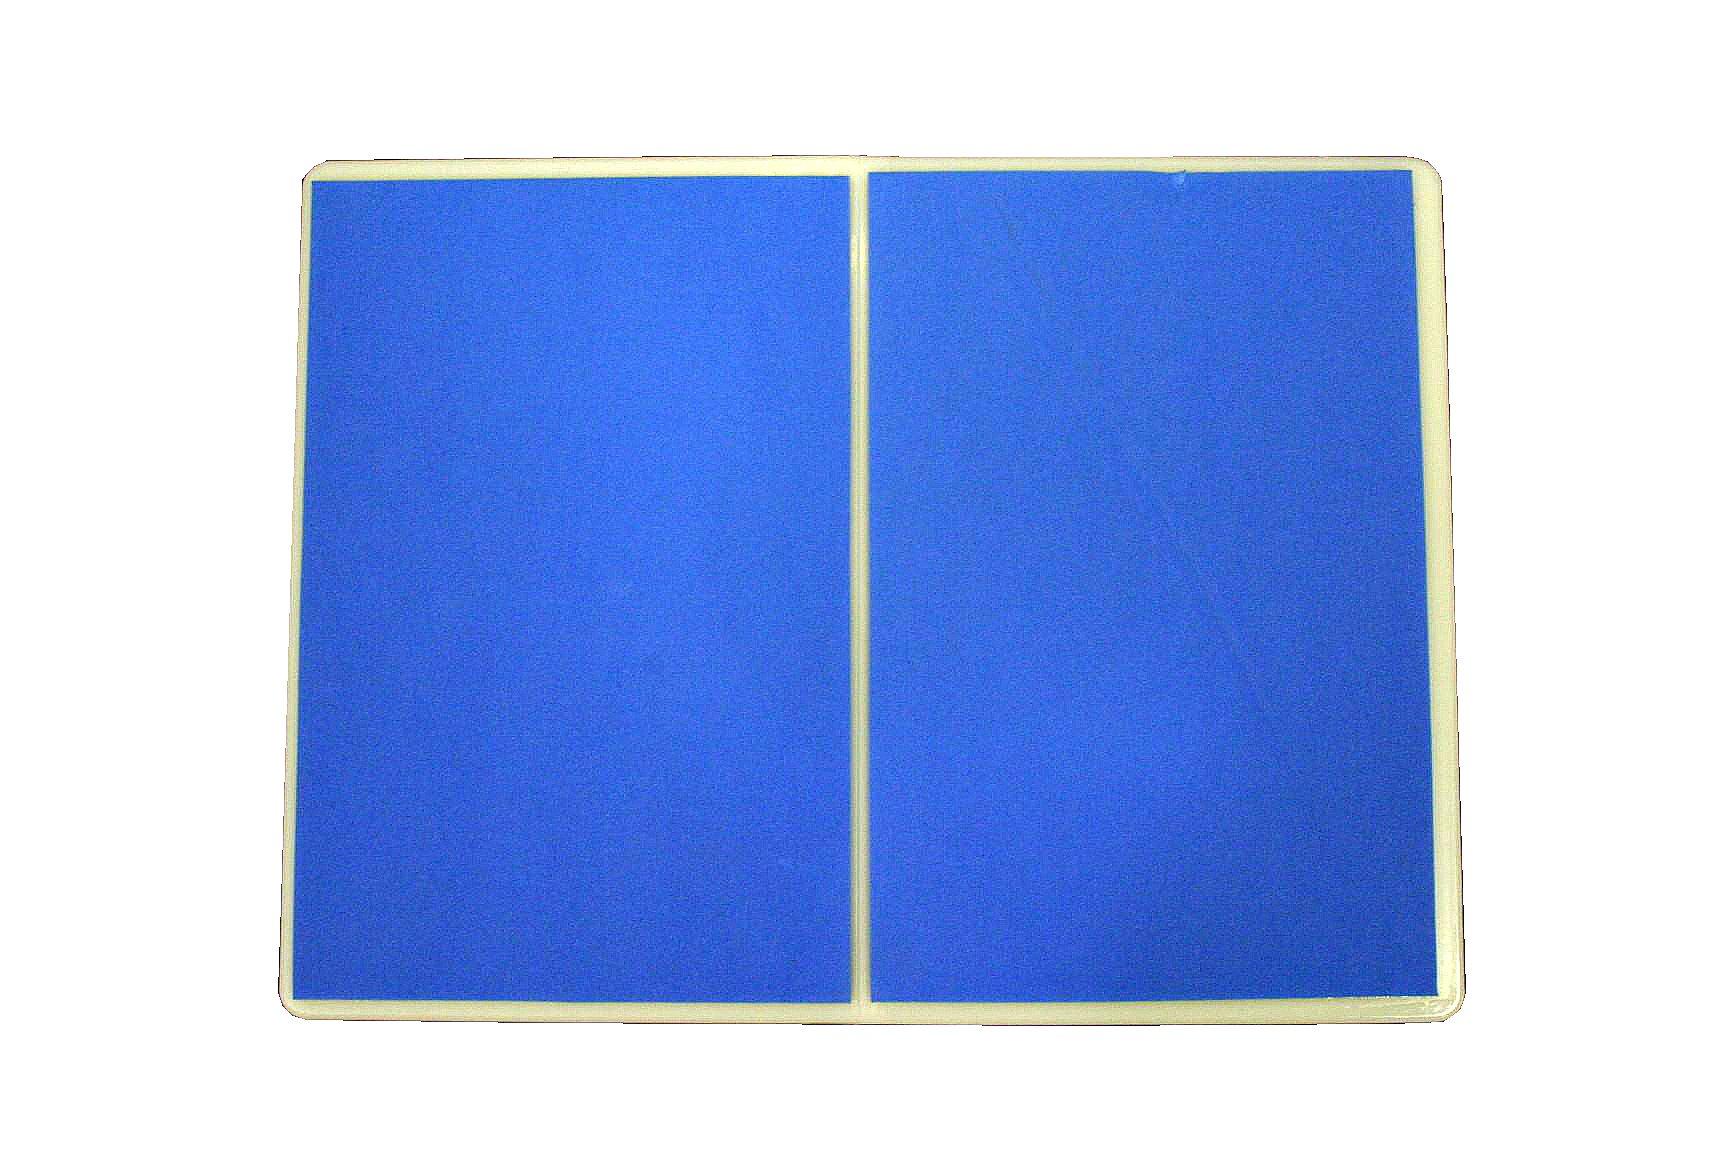 Ace Martial Arts Supply Rebreakable Board Taekwondo, MMA, Karate-Black (Blue) by Ace Martial Arts Supply